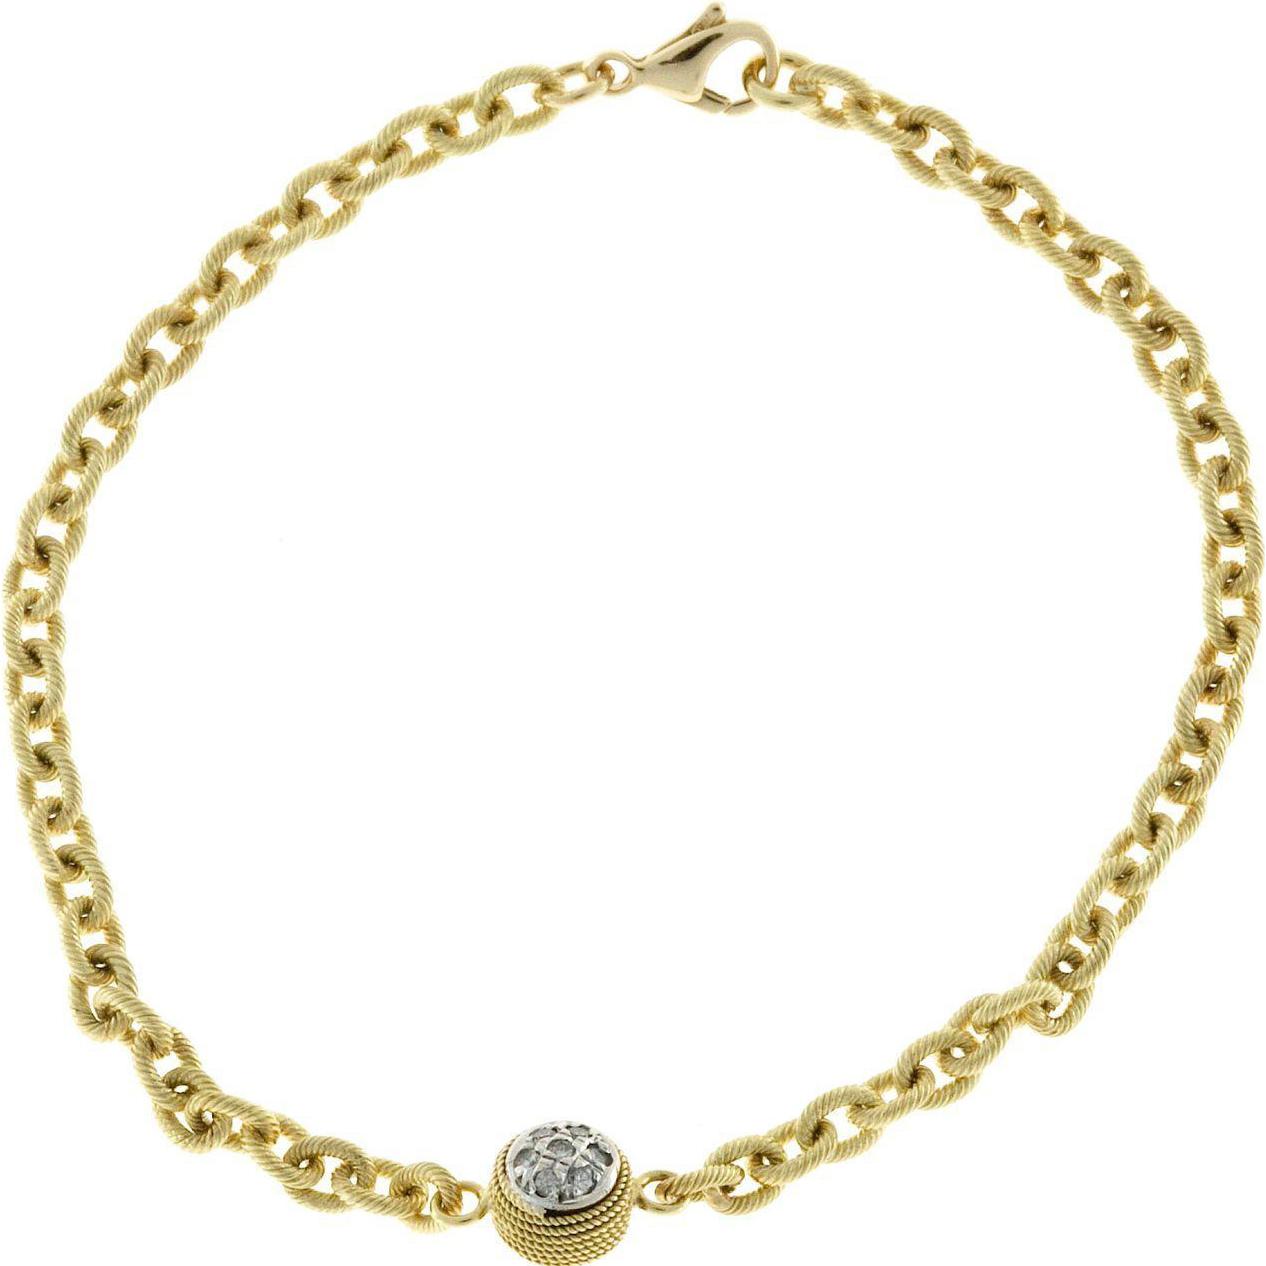 Diamond 18 Karat Gold Textured Bracelet